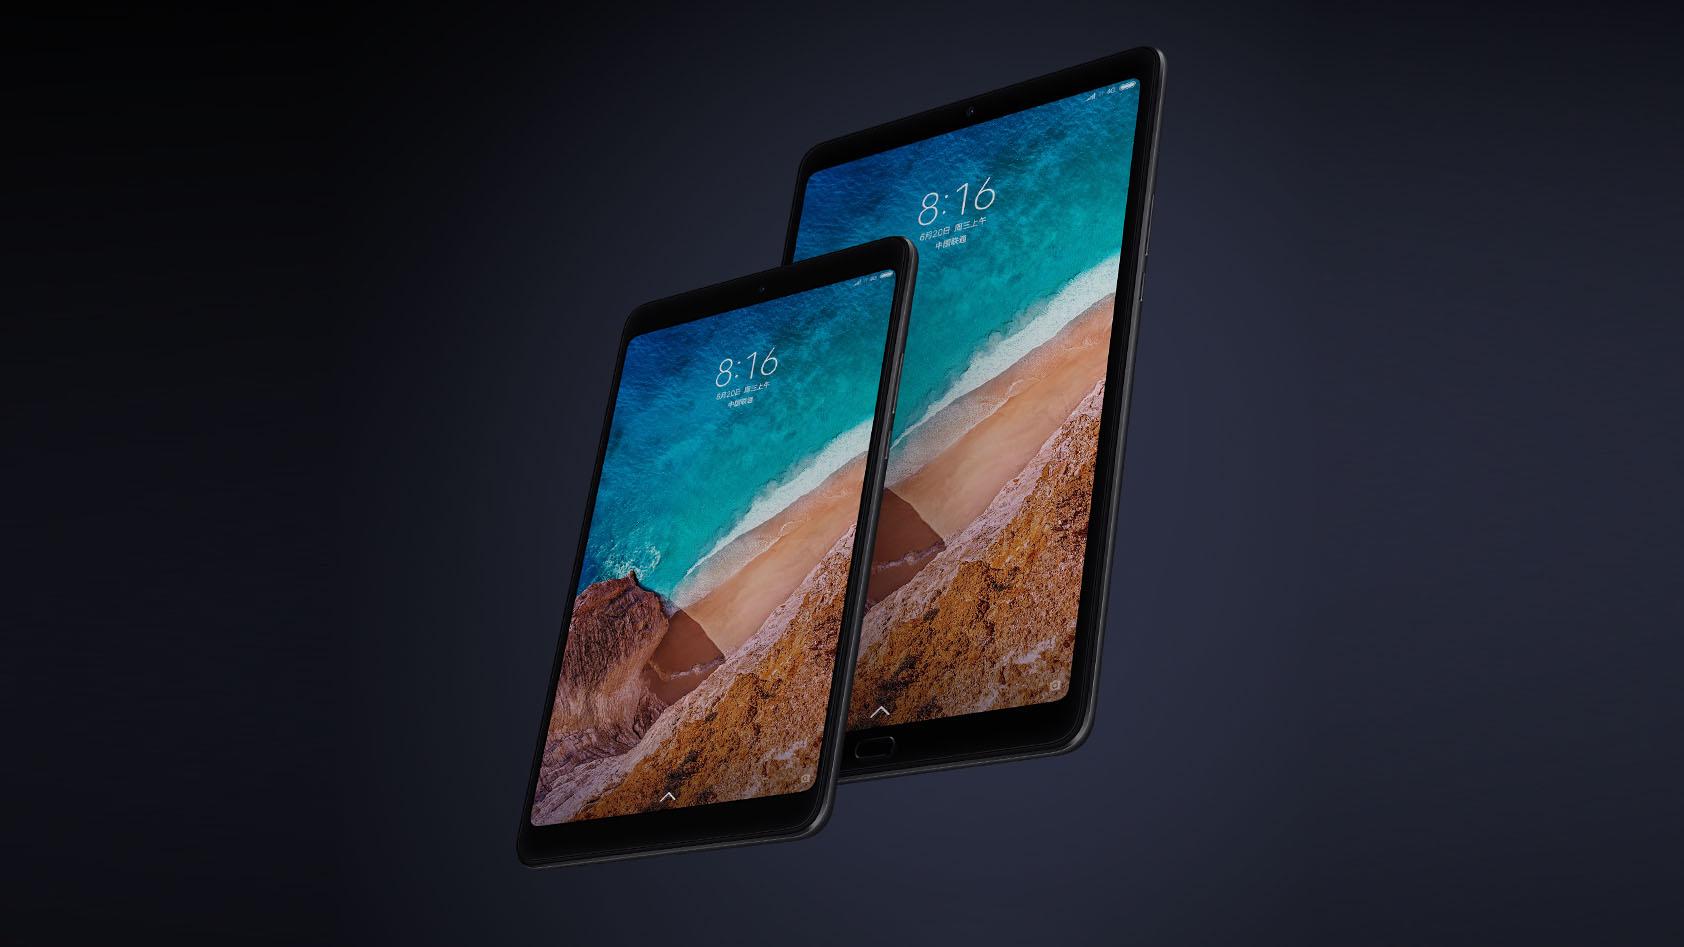 Представлен Xiaomi Mi Pad 4 Plus: 10,1-дюймовый дисплей и батарейка на 8620 мАч